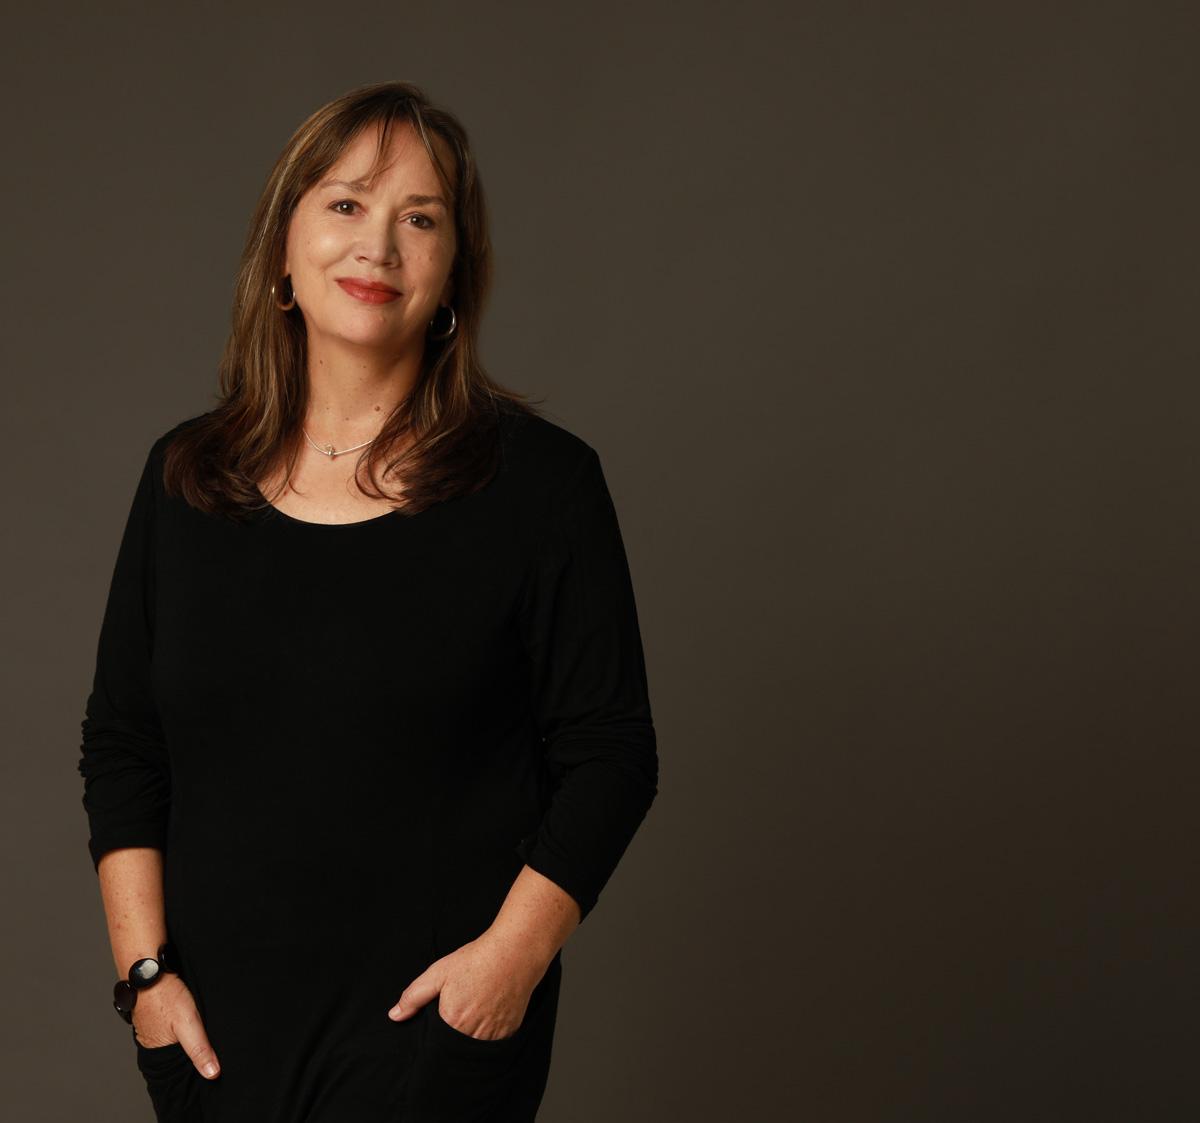 Arts writer Victoria Hynes